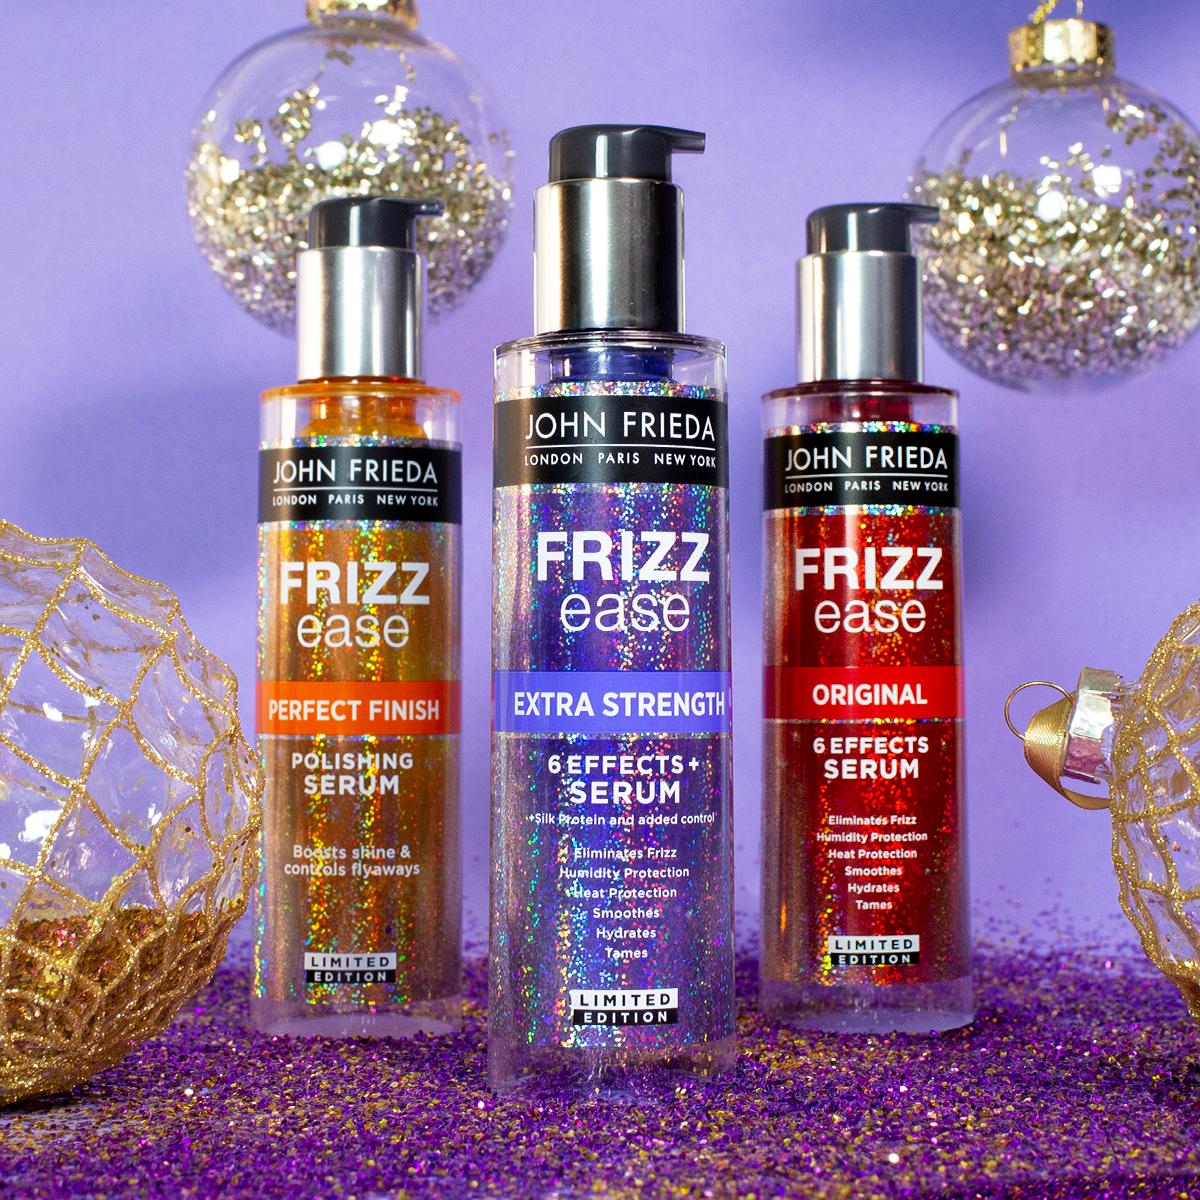 John Freda Anti-Frizz Frizz Ease Sparkly Serum